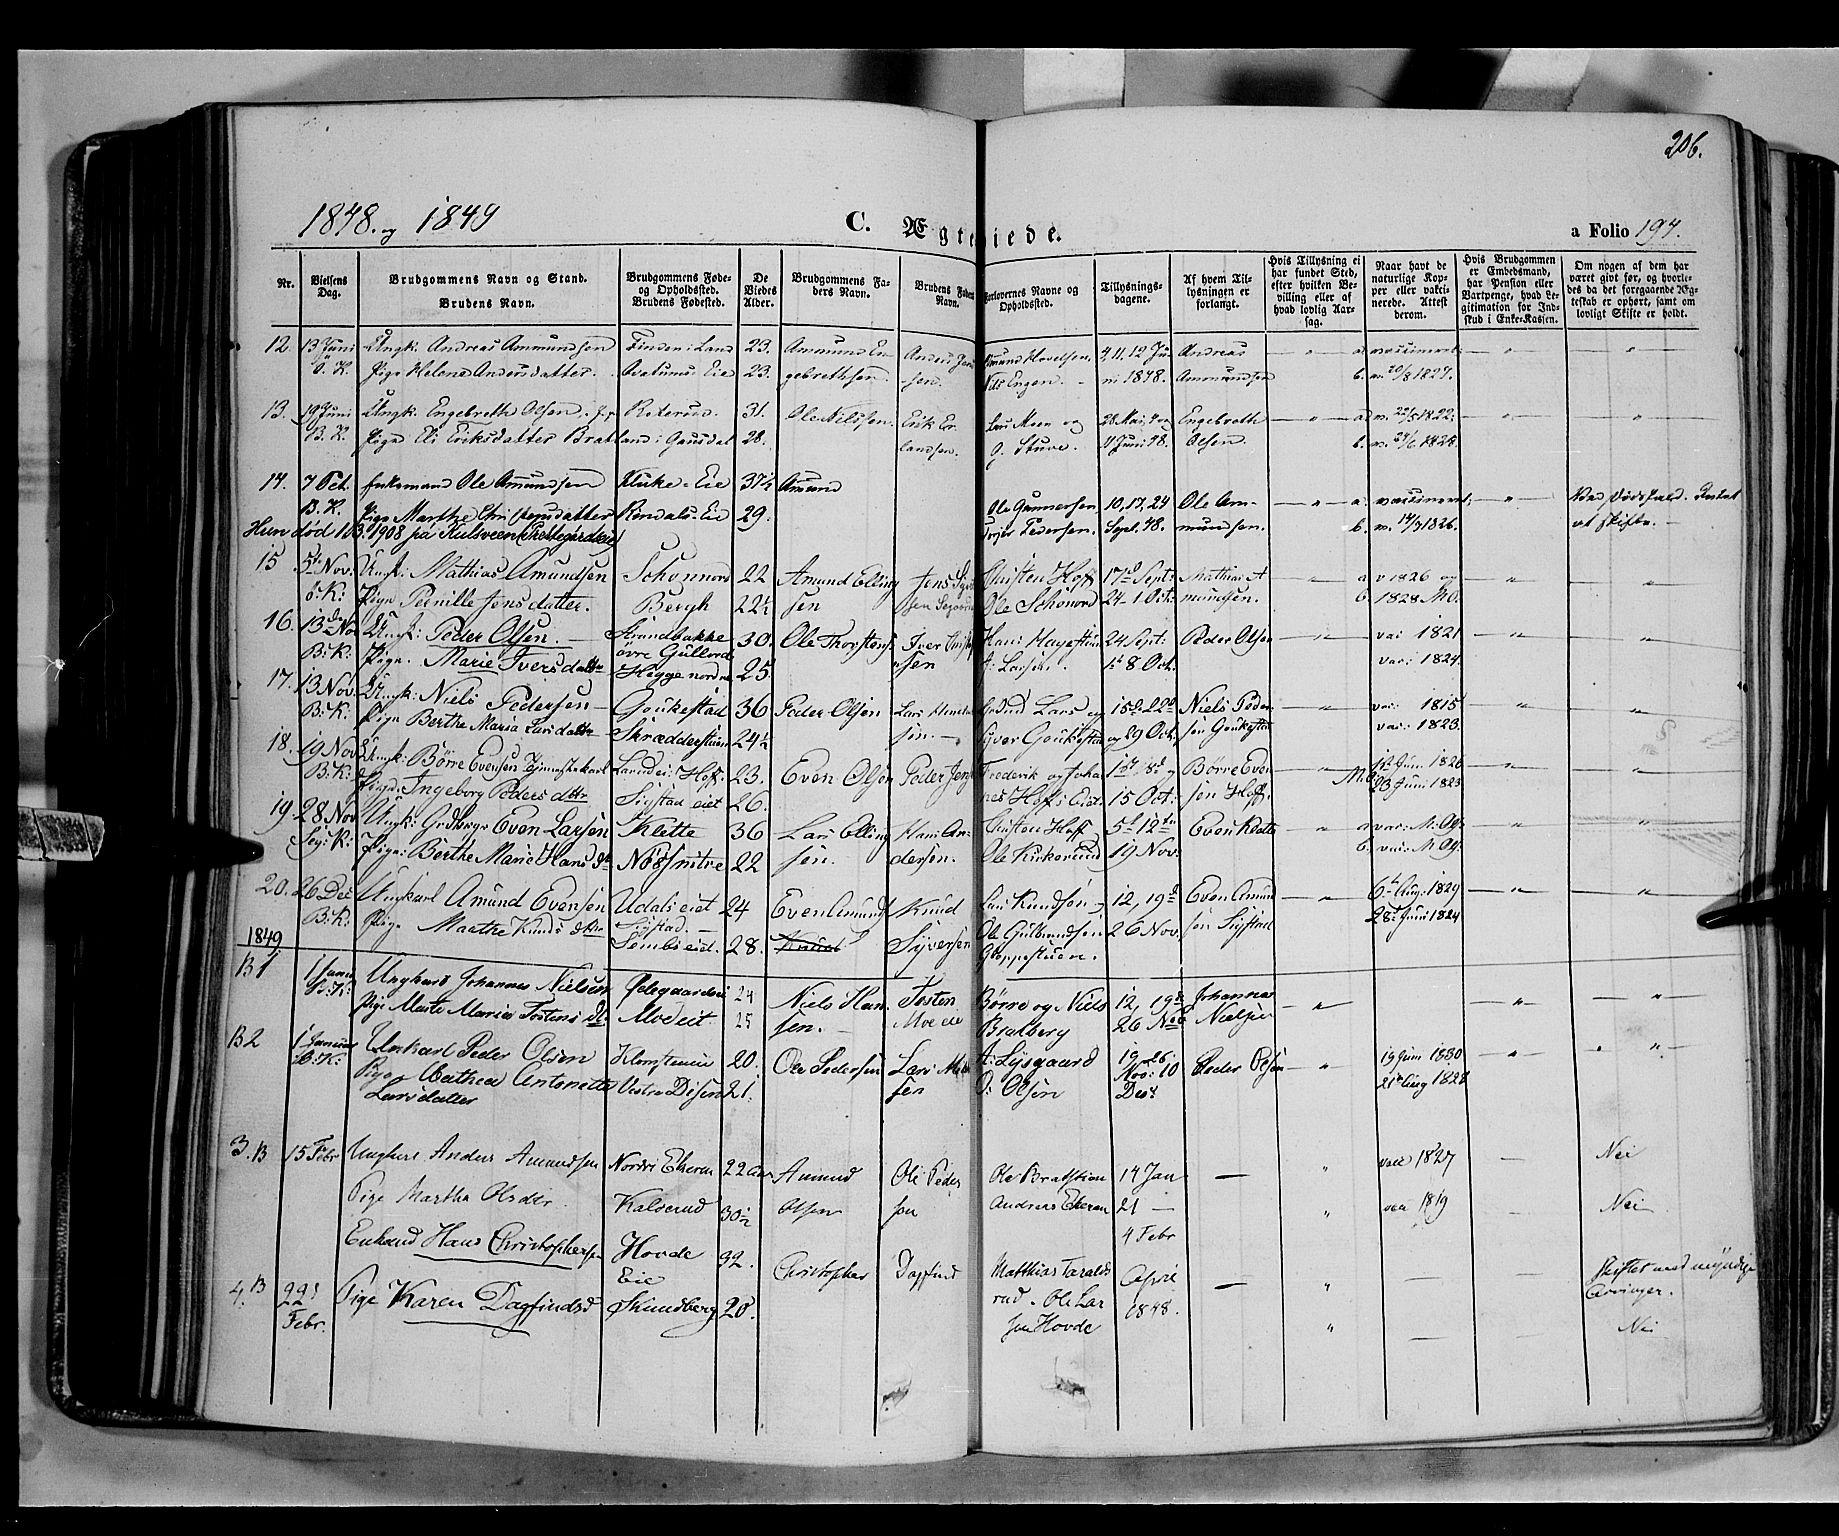 SAH, Biri prestekontor, Ministerialbok nr. 5, 1843-1854, s. 206